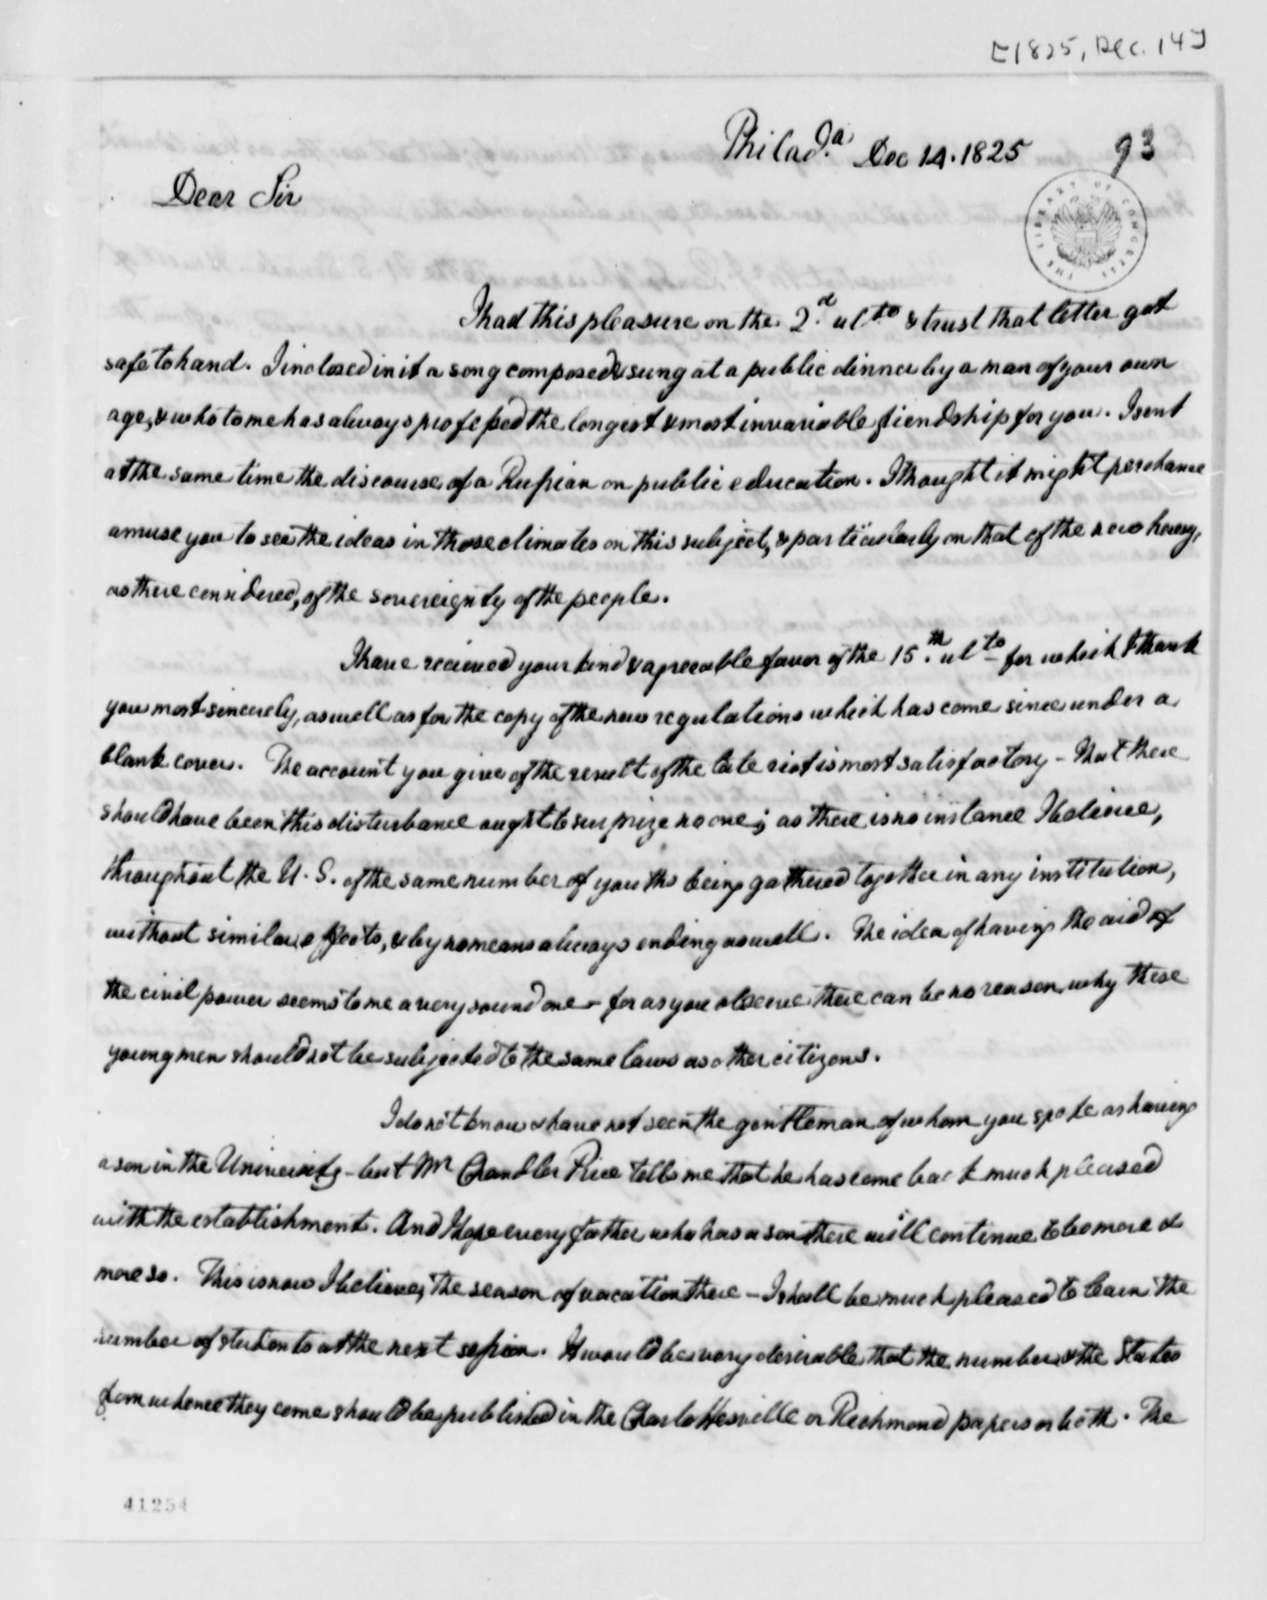 William Short to Thomas Jefferson, December 14, 1825